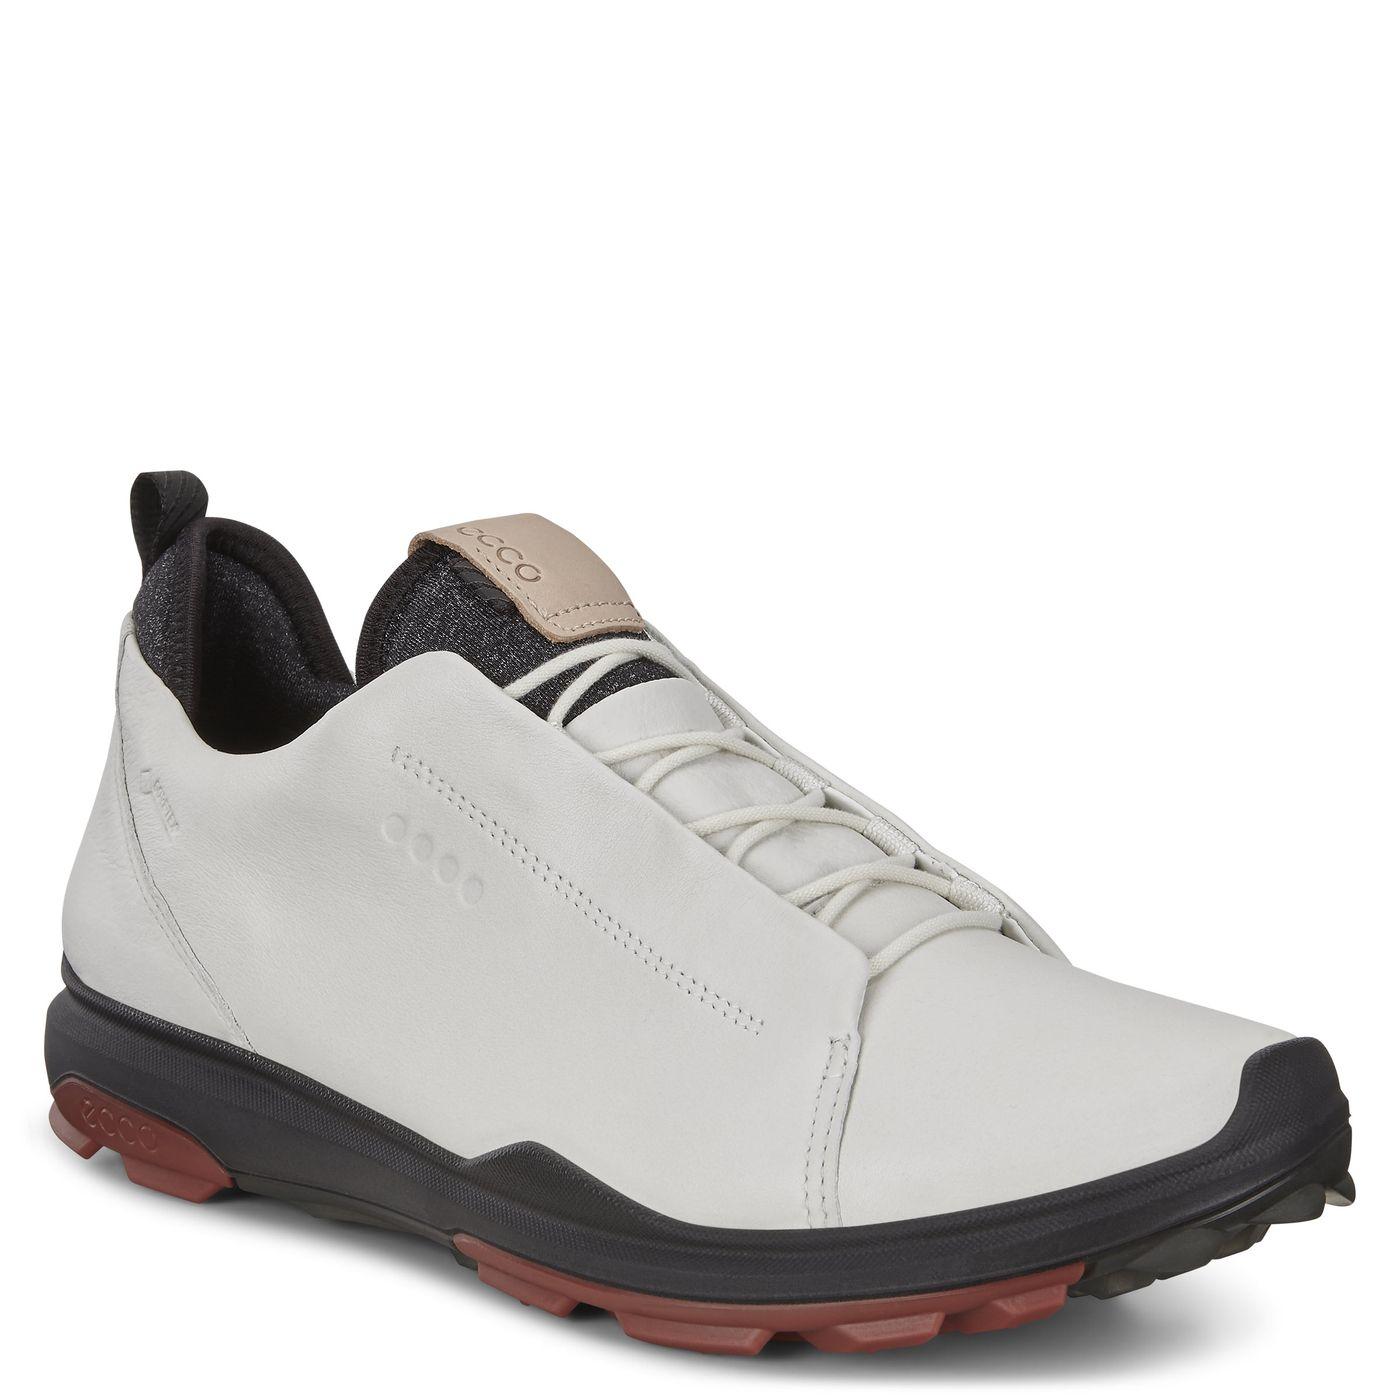 Shoes mens, Ecco shoes, Golf shoes mens